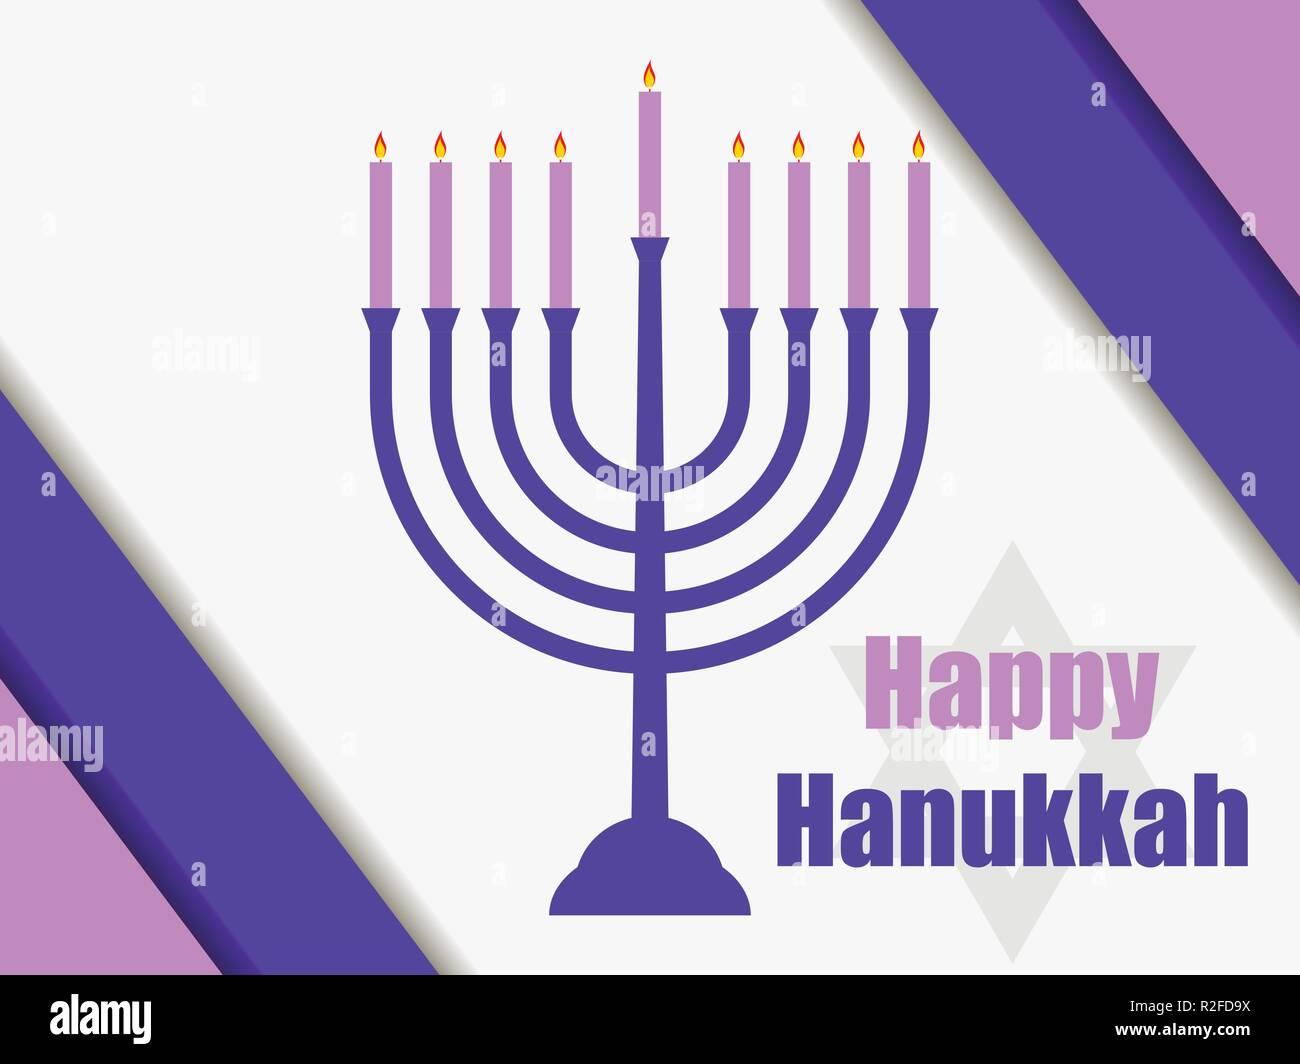 Happy hanukkah. Hanukkah candles. Menorah with nine candles. Vector illustration - Stock Vector